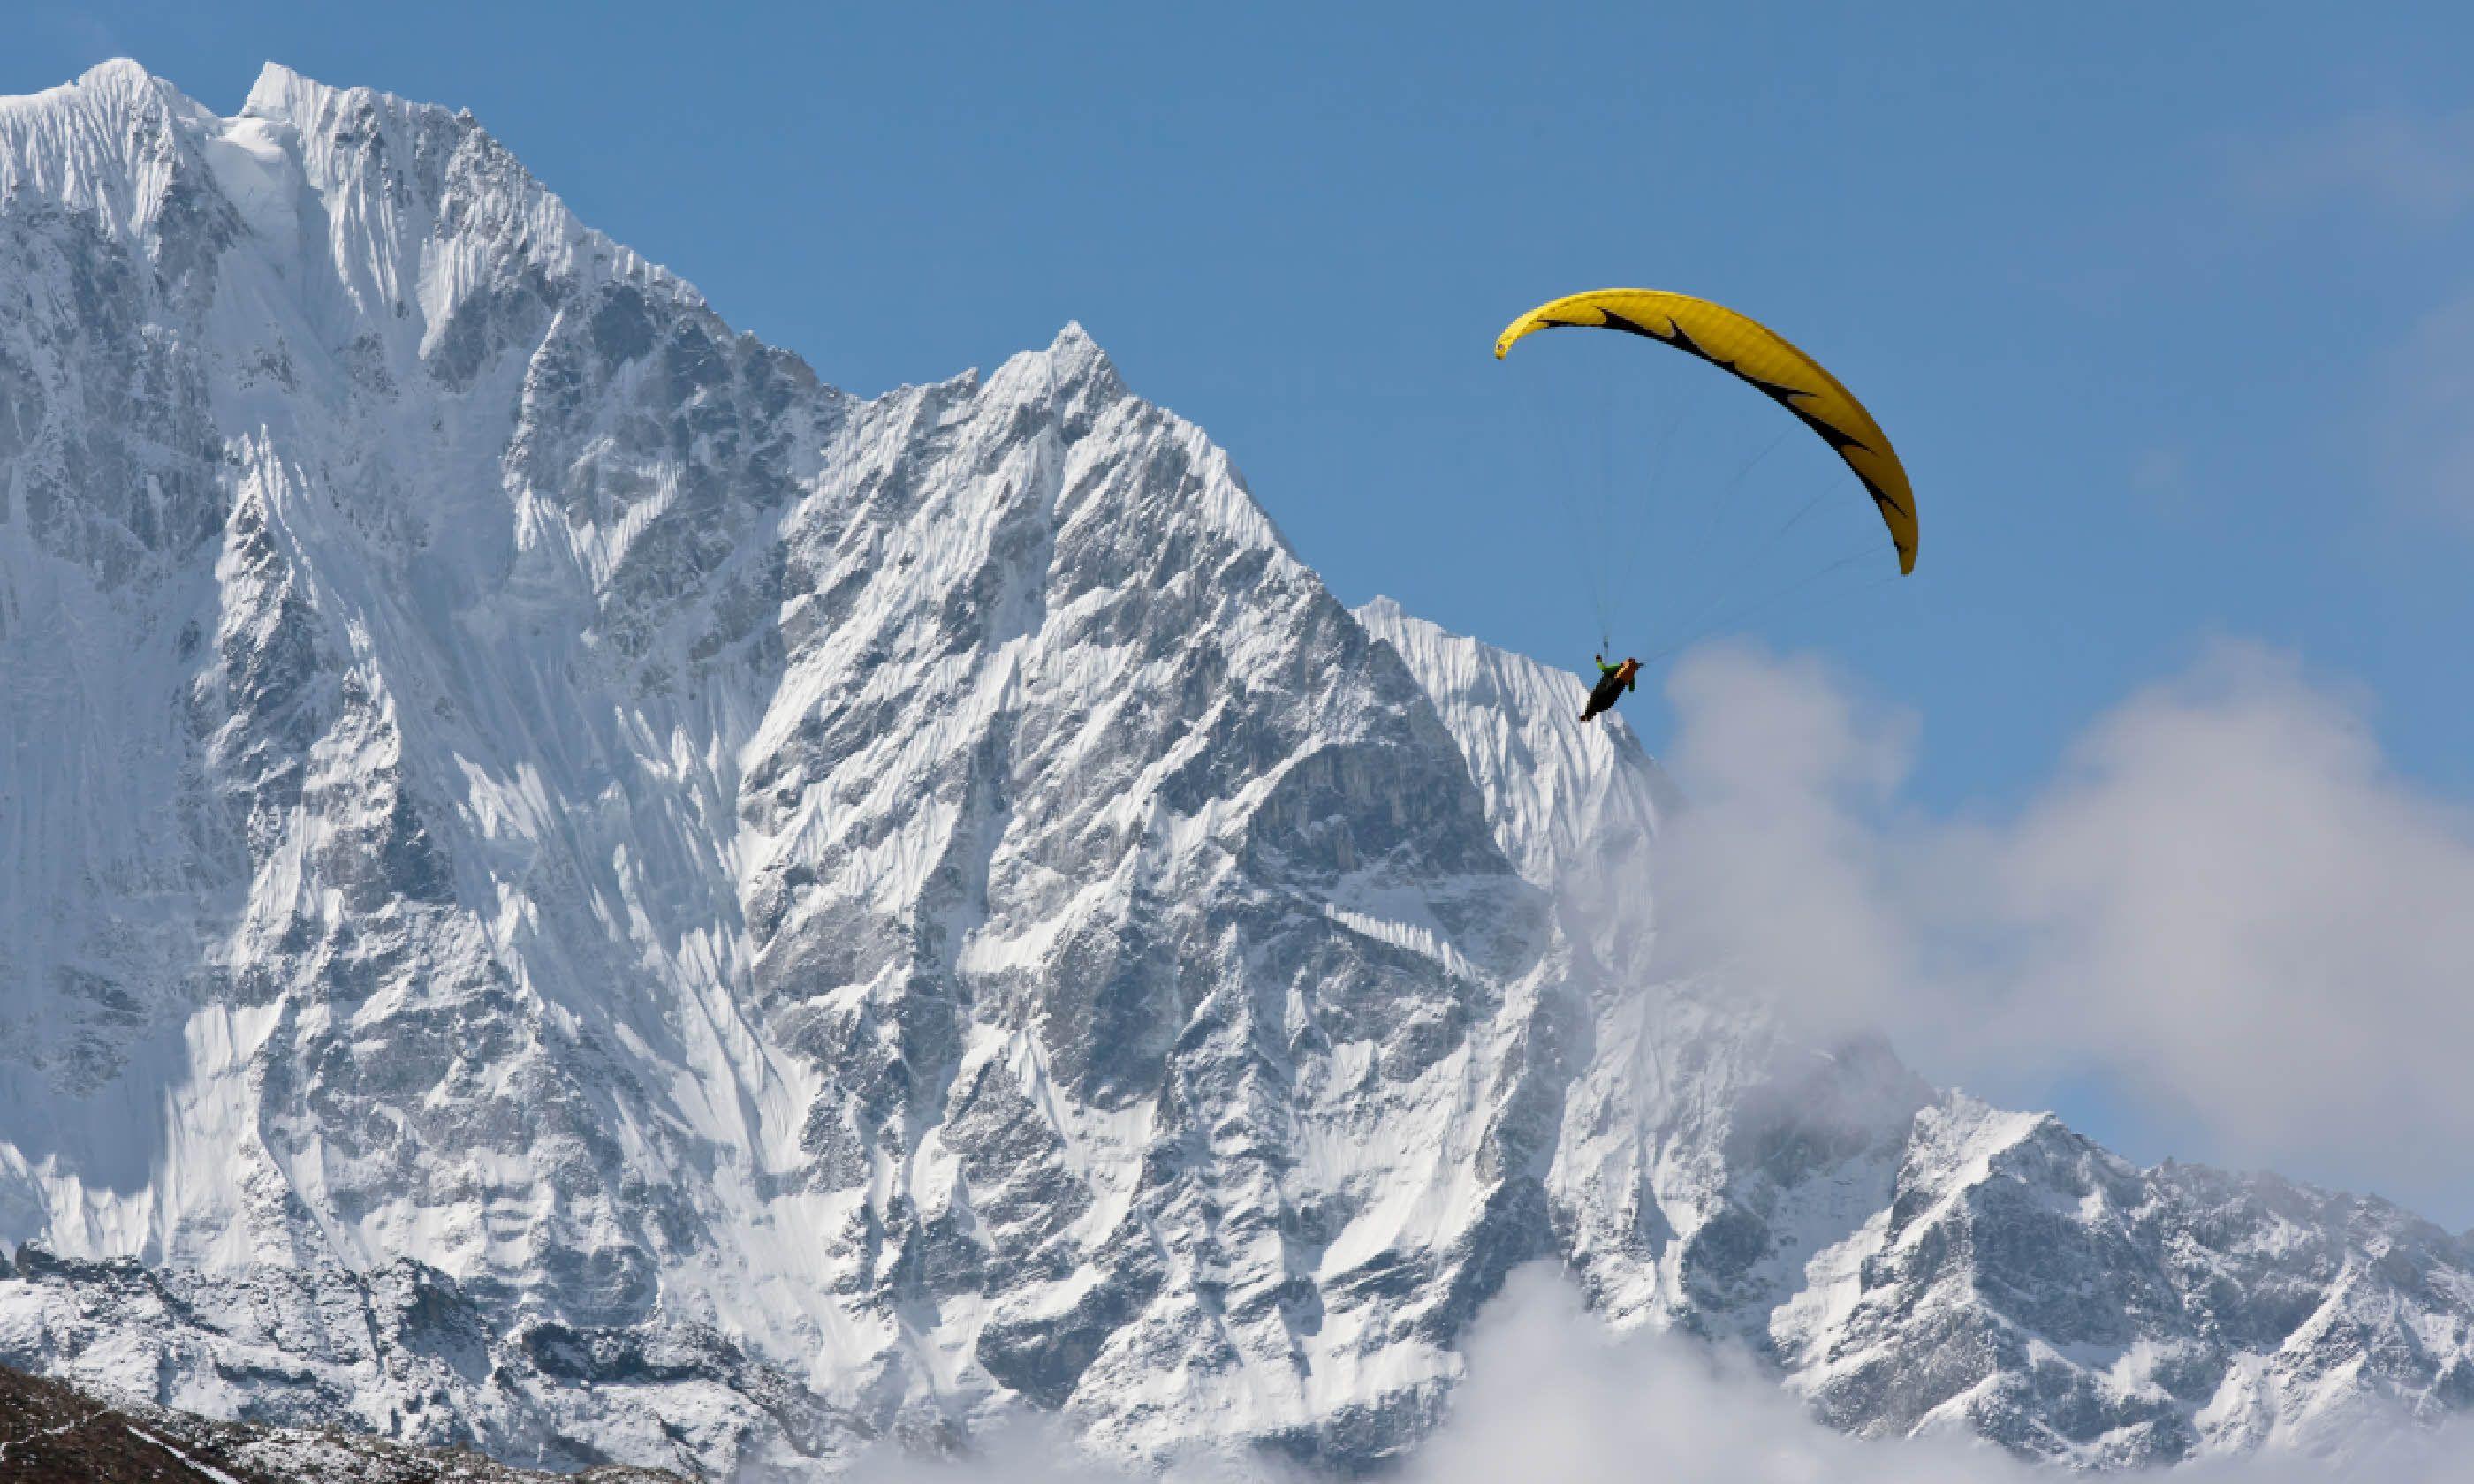 Paragliding over Nepal (Shutterstock)